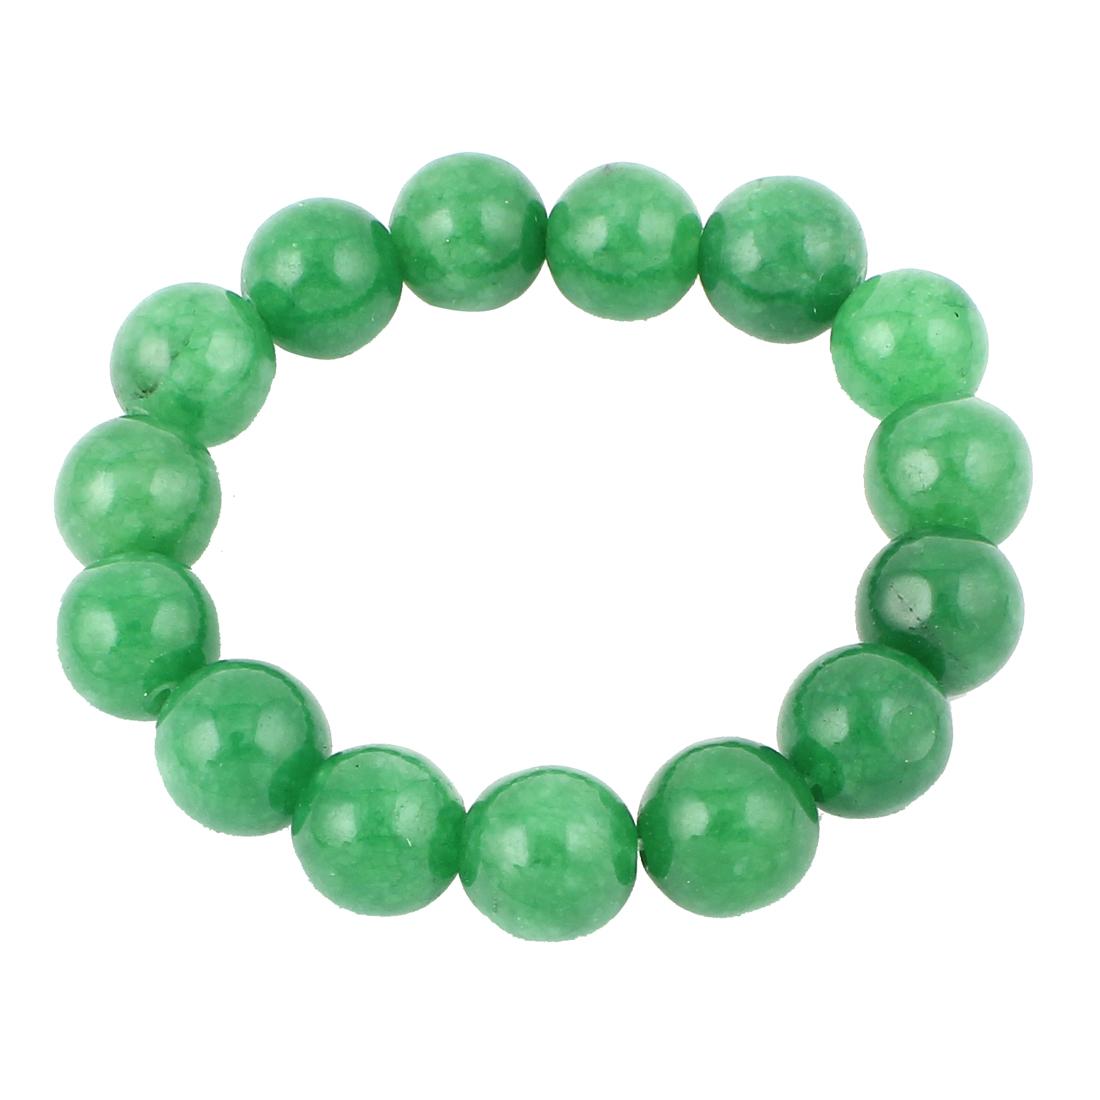 Lady Round Faux Jade Decor Elastic Wrist Stretchy Bangle Bracelet Green